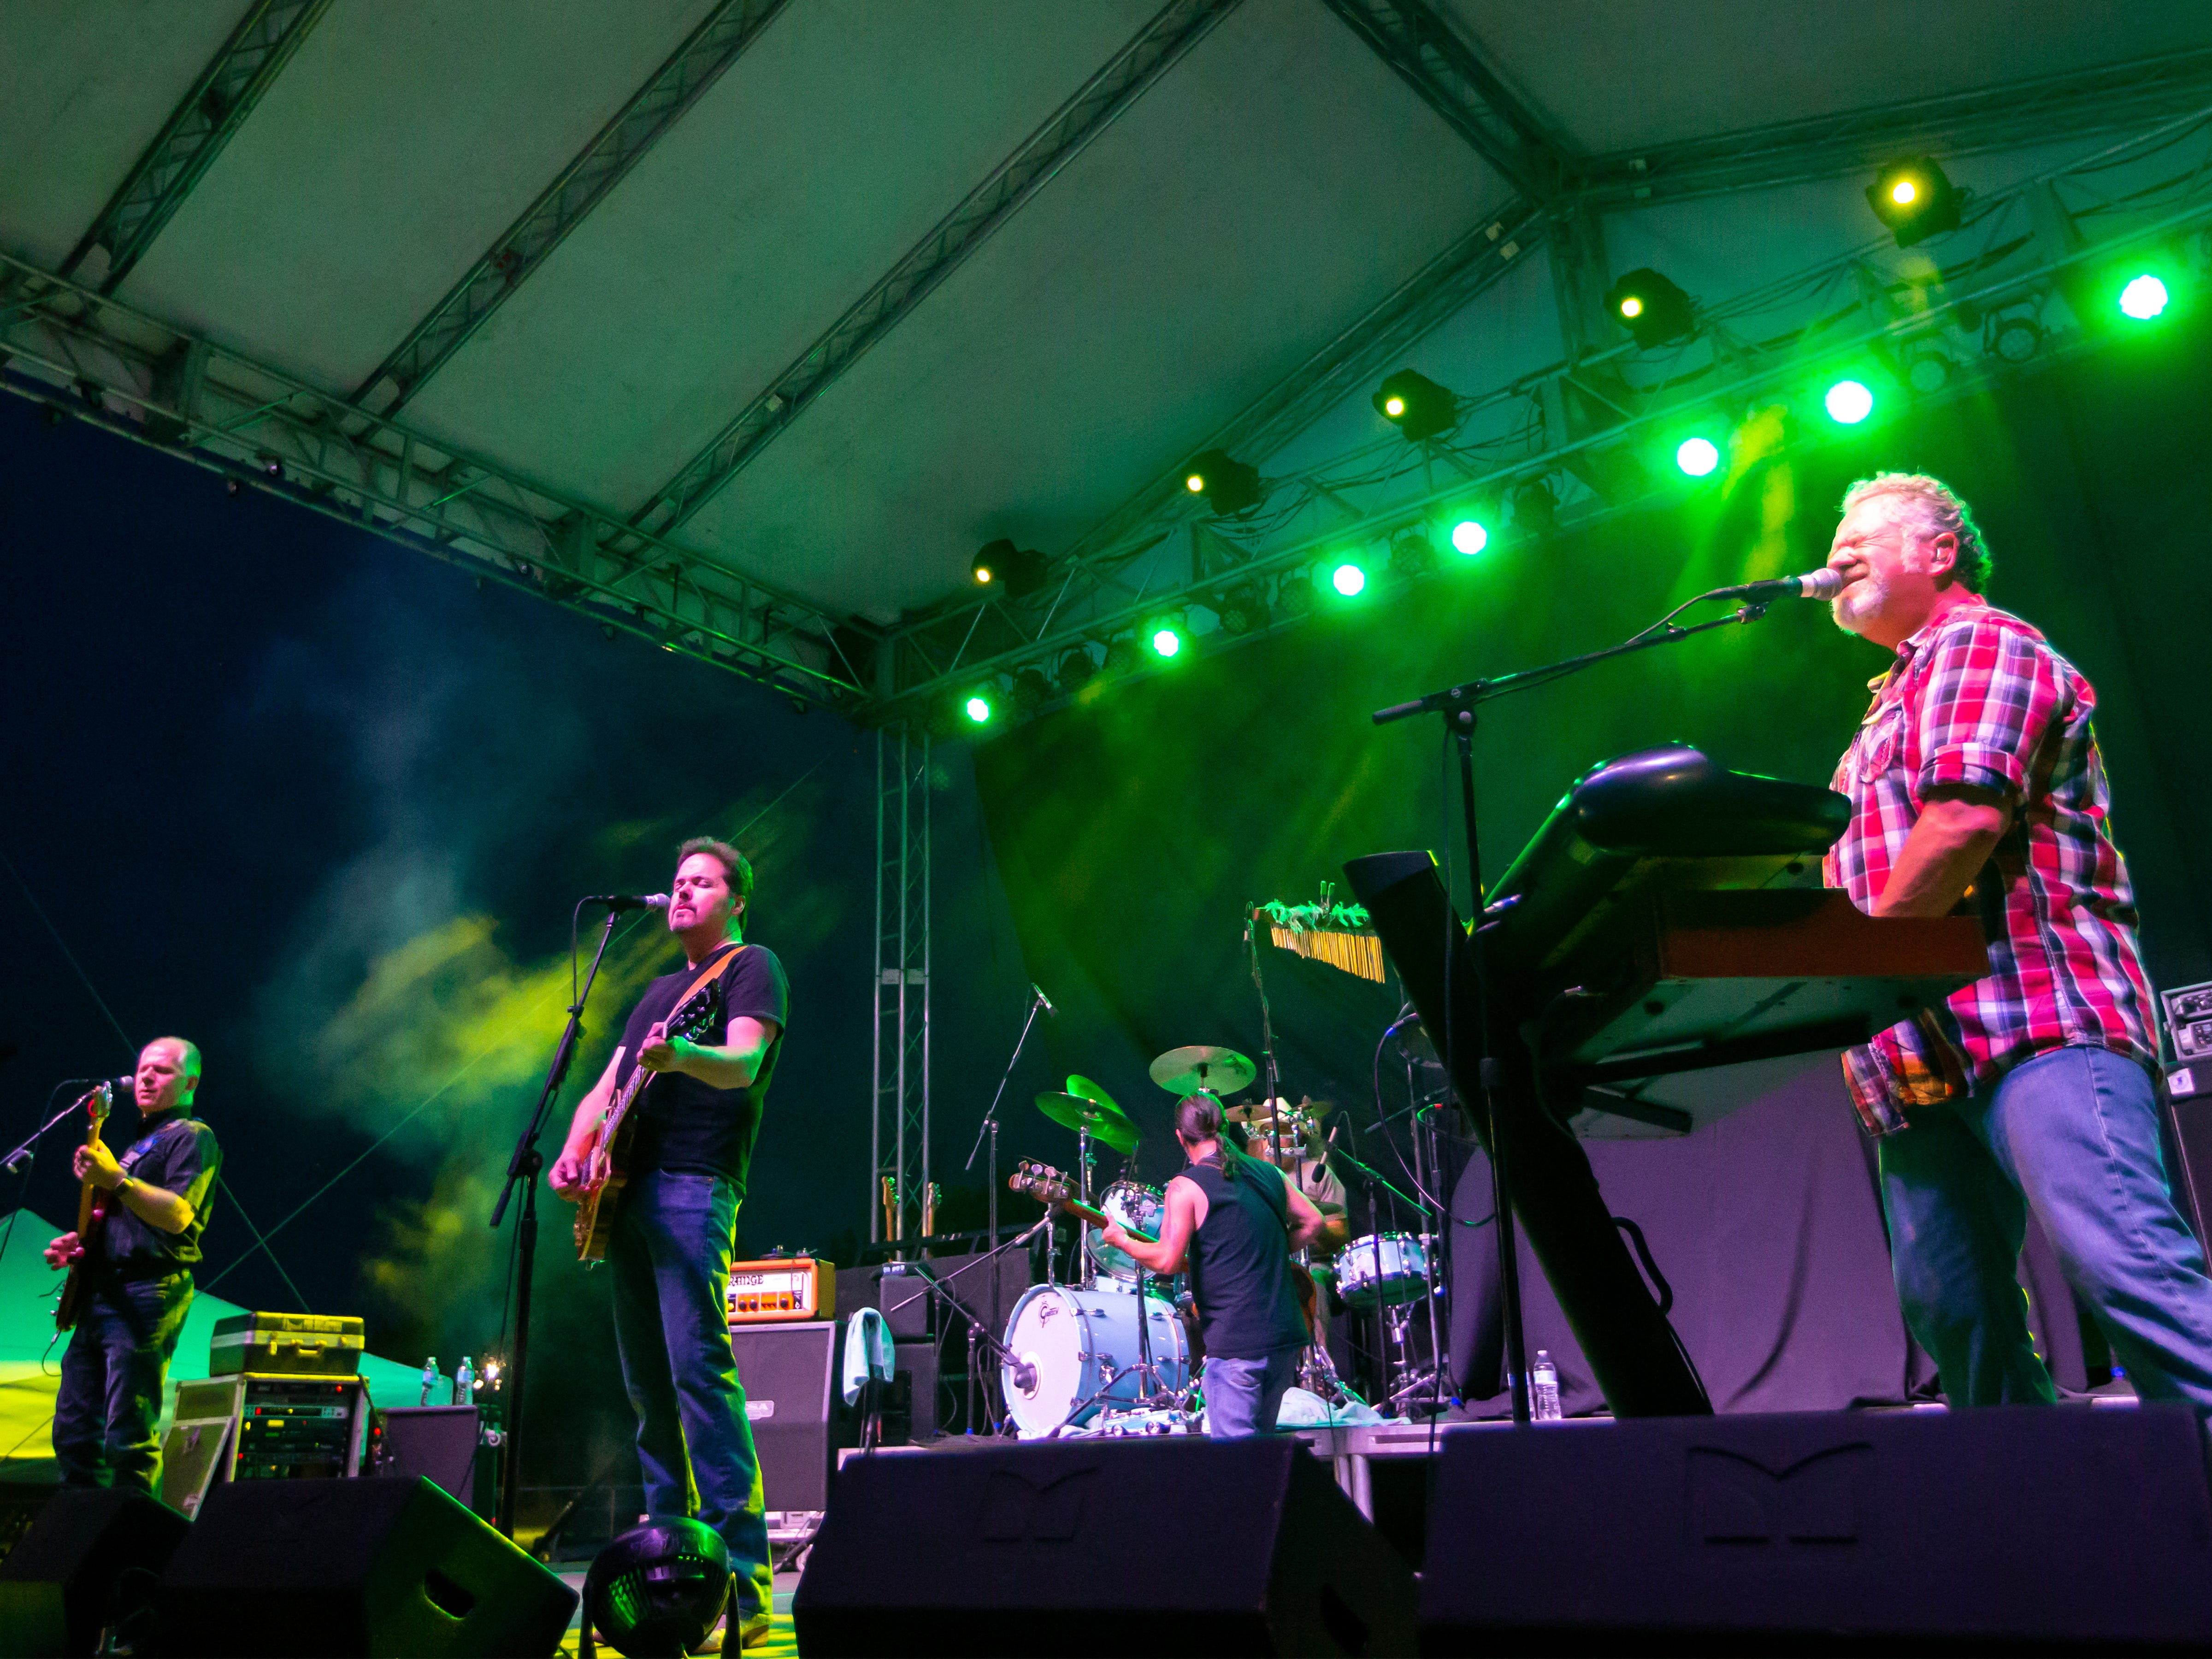 The Kentucky Headhunters perform during the Winnebago County Fair on Saturday, Aug. 4, 2018.